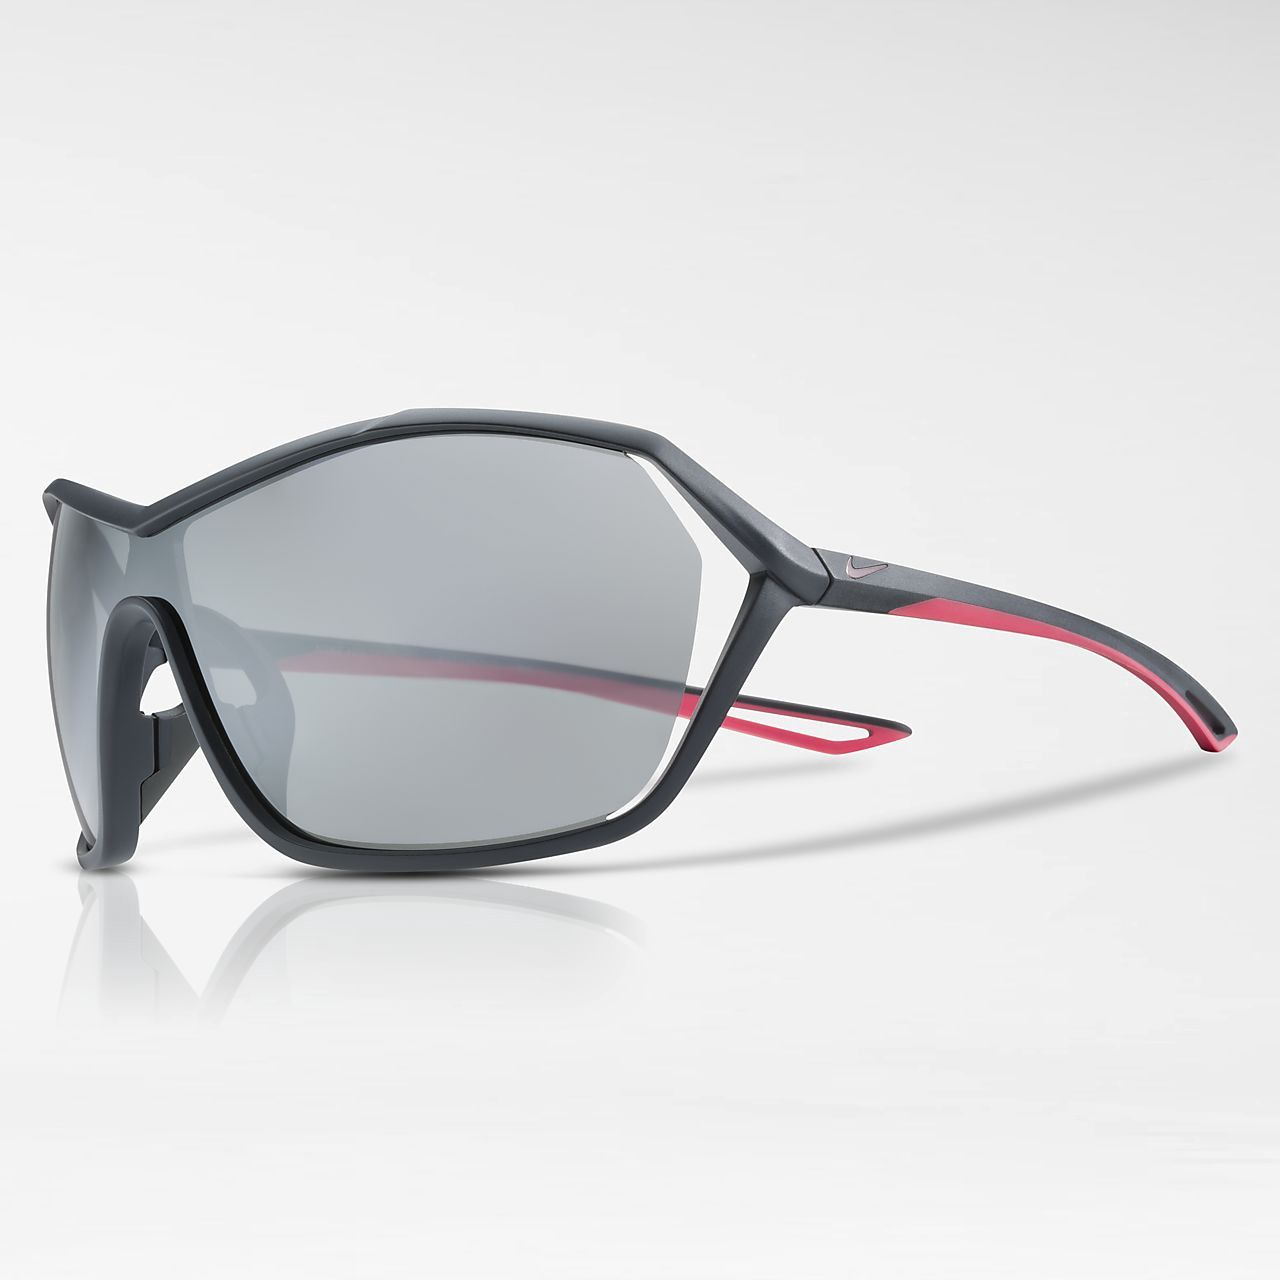 Nike Helix Elite Sunglasses One Size Anthracite Sports